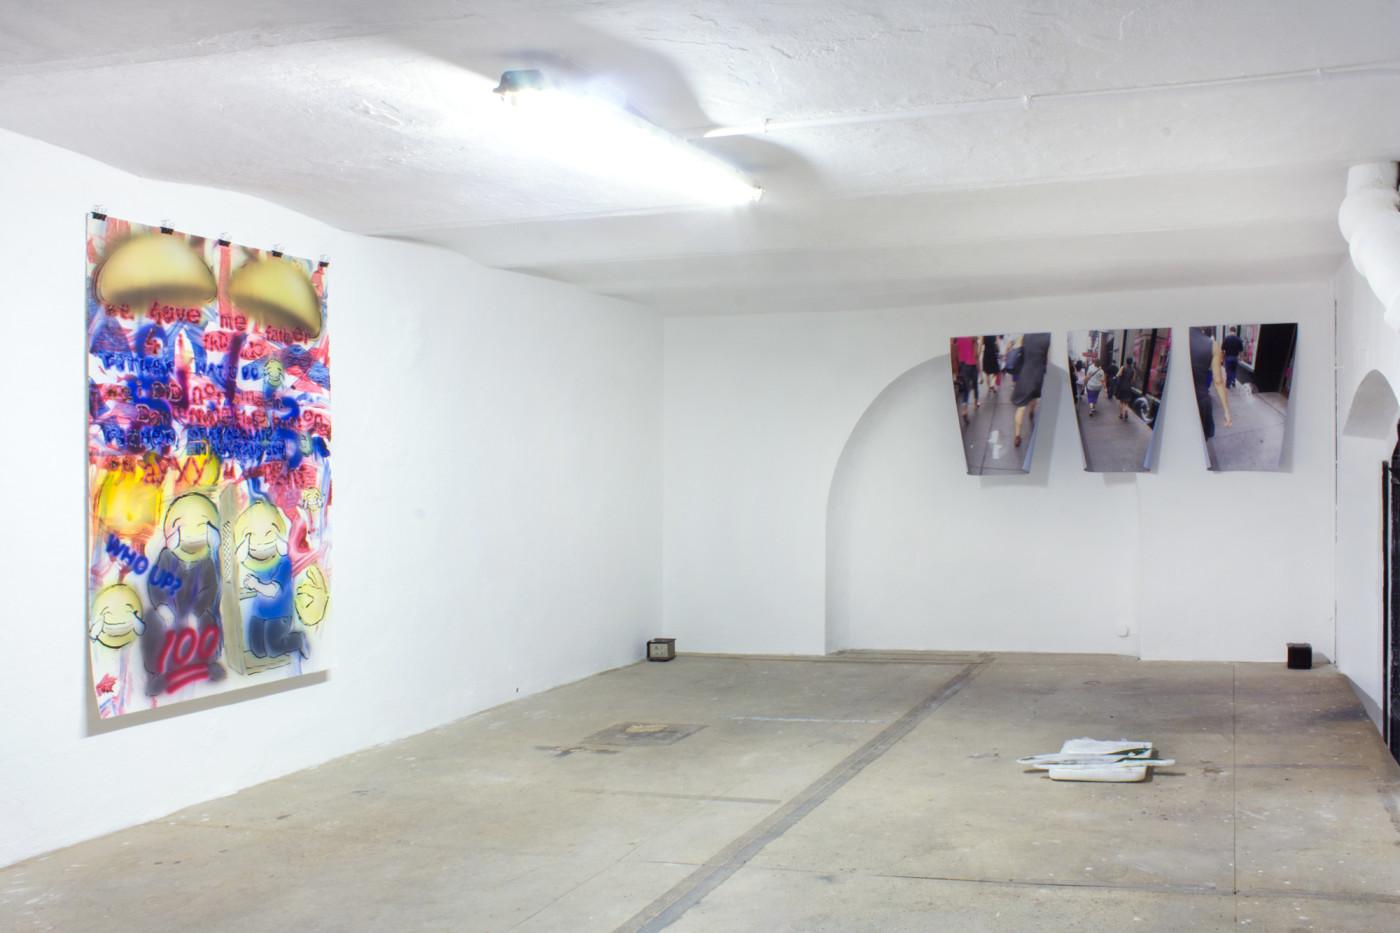 bb5000studio_corazon_installation_view_4